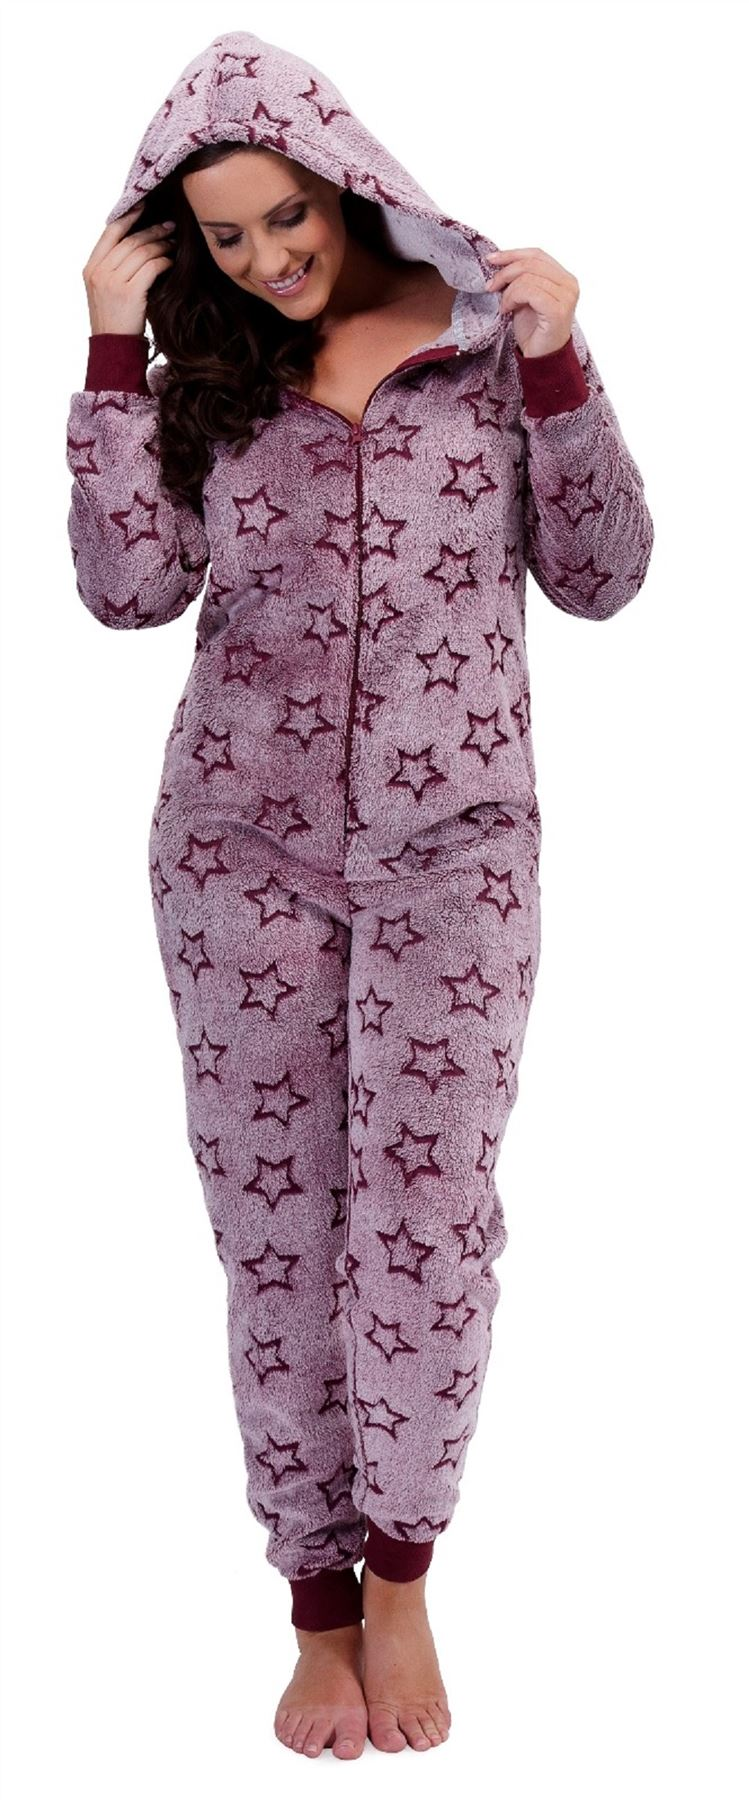 grenouill re femme de d tente combinaison ln636 soft one piece pyjama 8 10 12 14 16 18 ebay. Black Bedroom Furniture Sets. Home Design Ideas